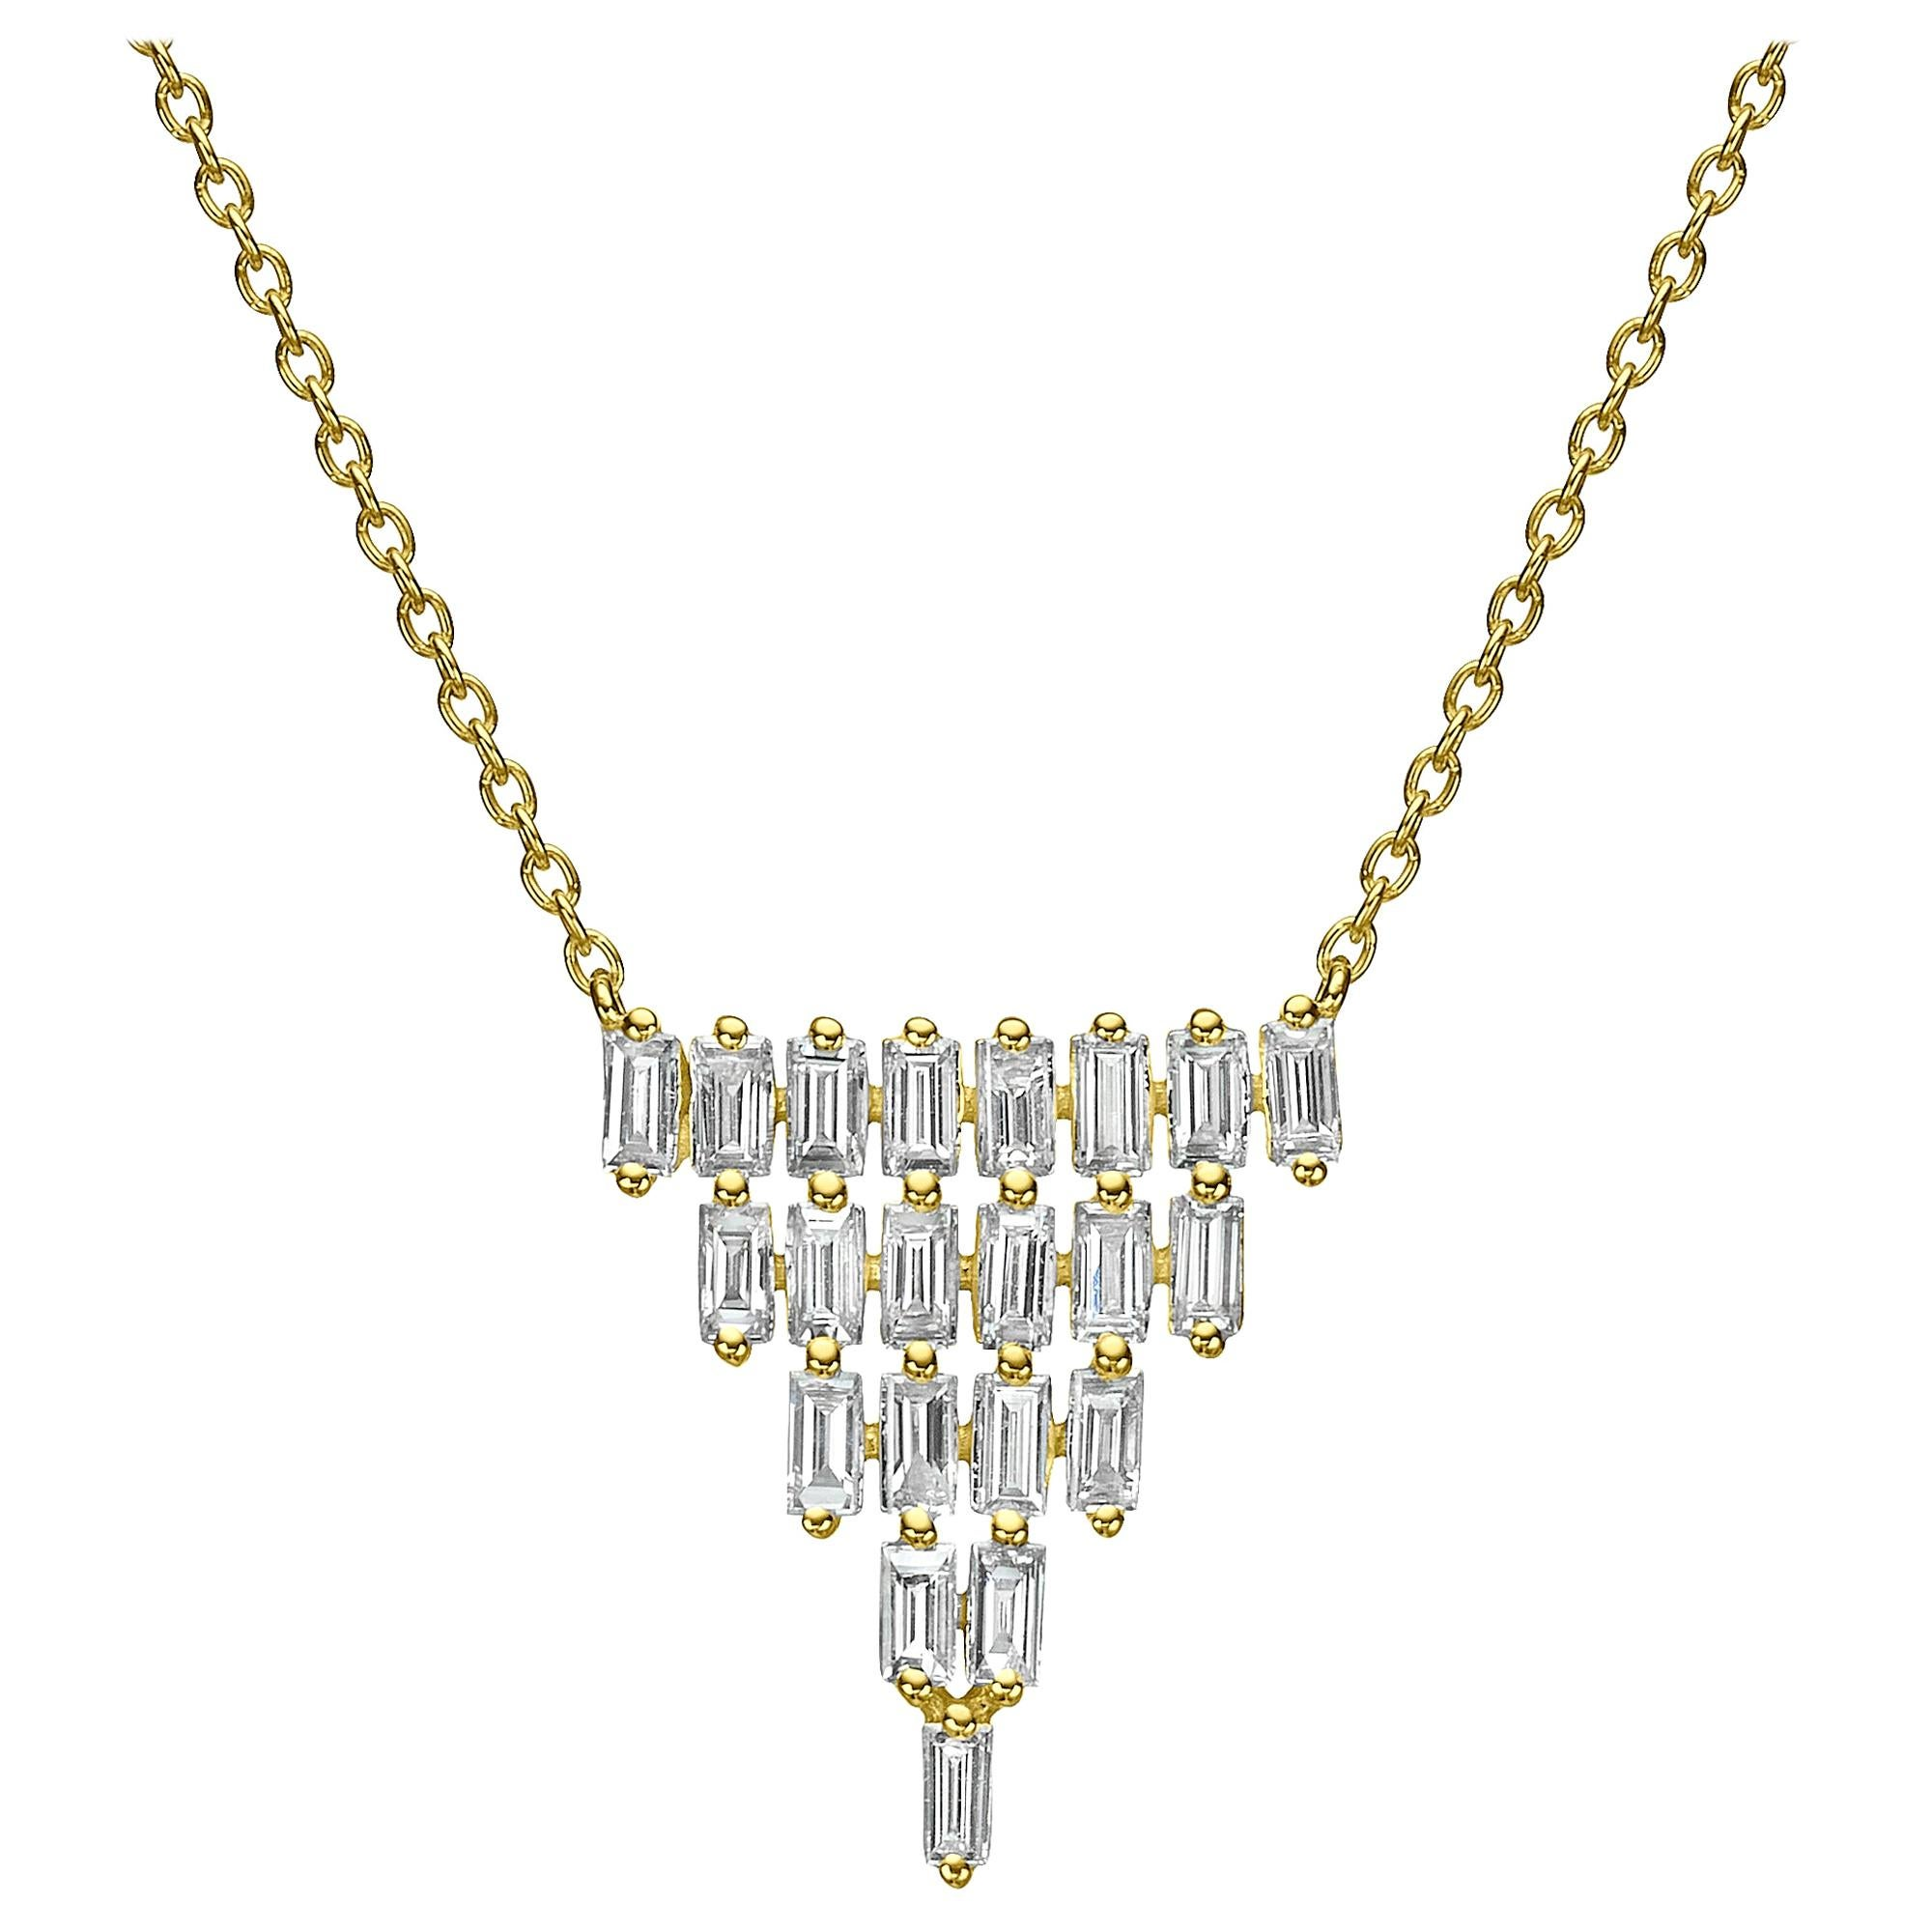 18 Karat Gold 1.59 Carat F Color VS Clarity Multi-Layer Triangle Diamond Pendant